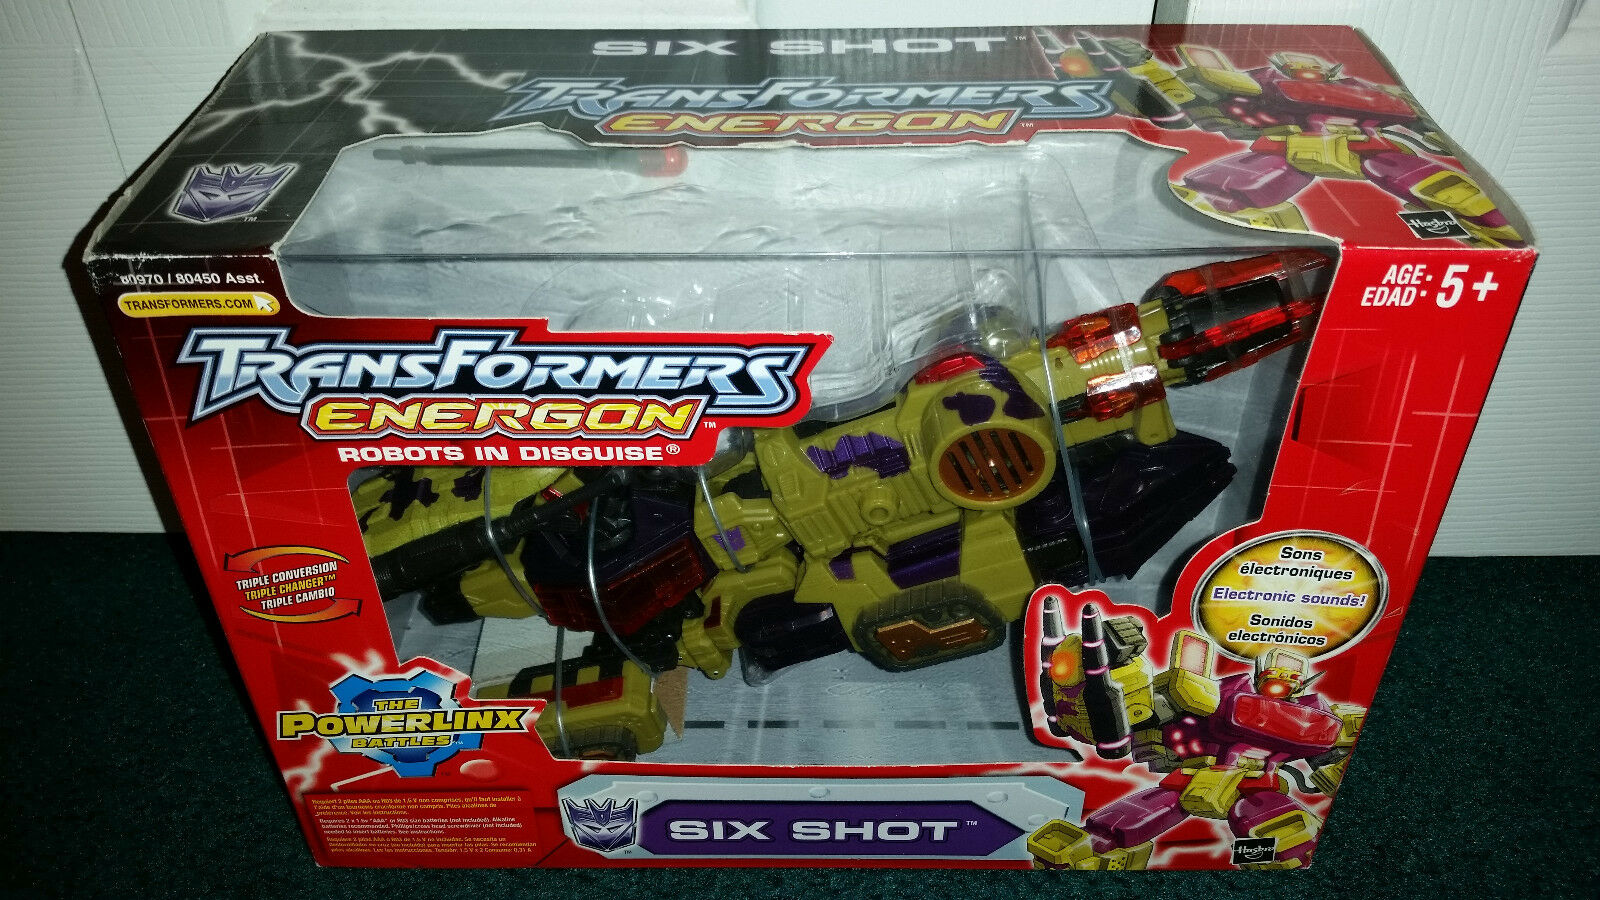 Six Shot Energon Transformers Hasbro MISP  2004 The Powerlinx Battles